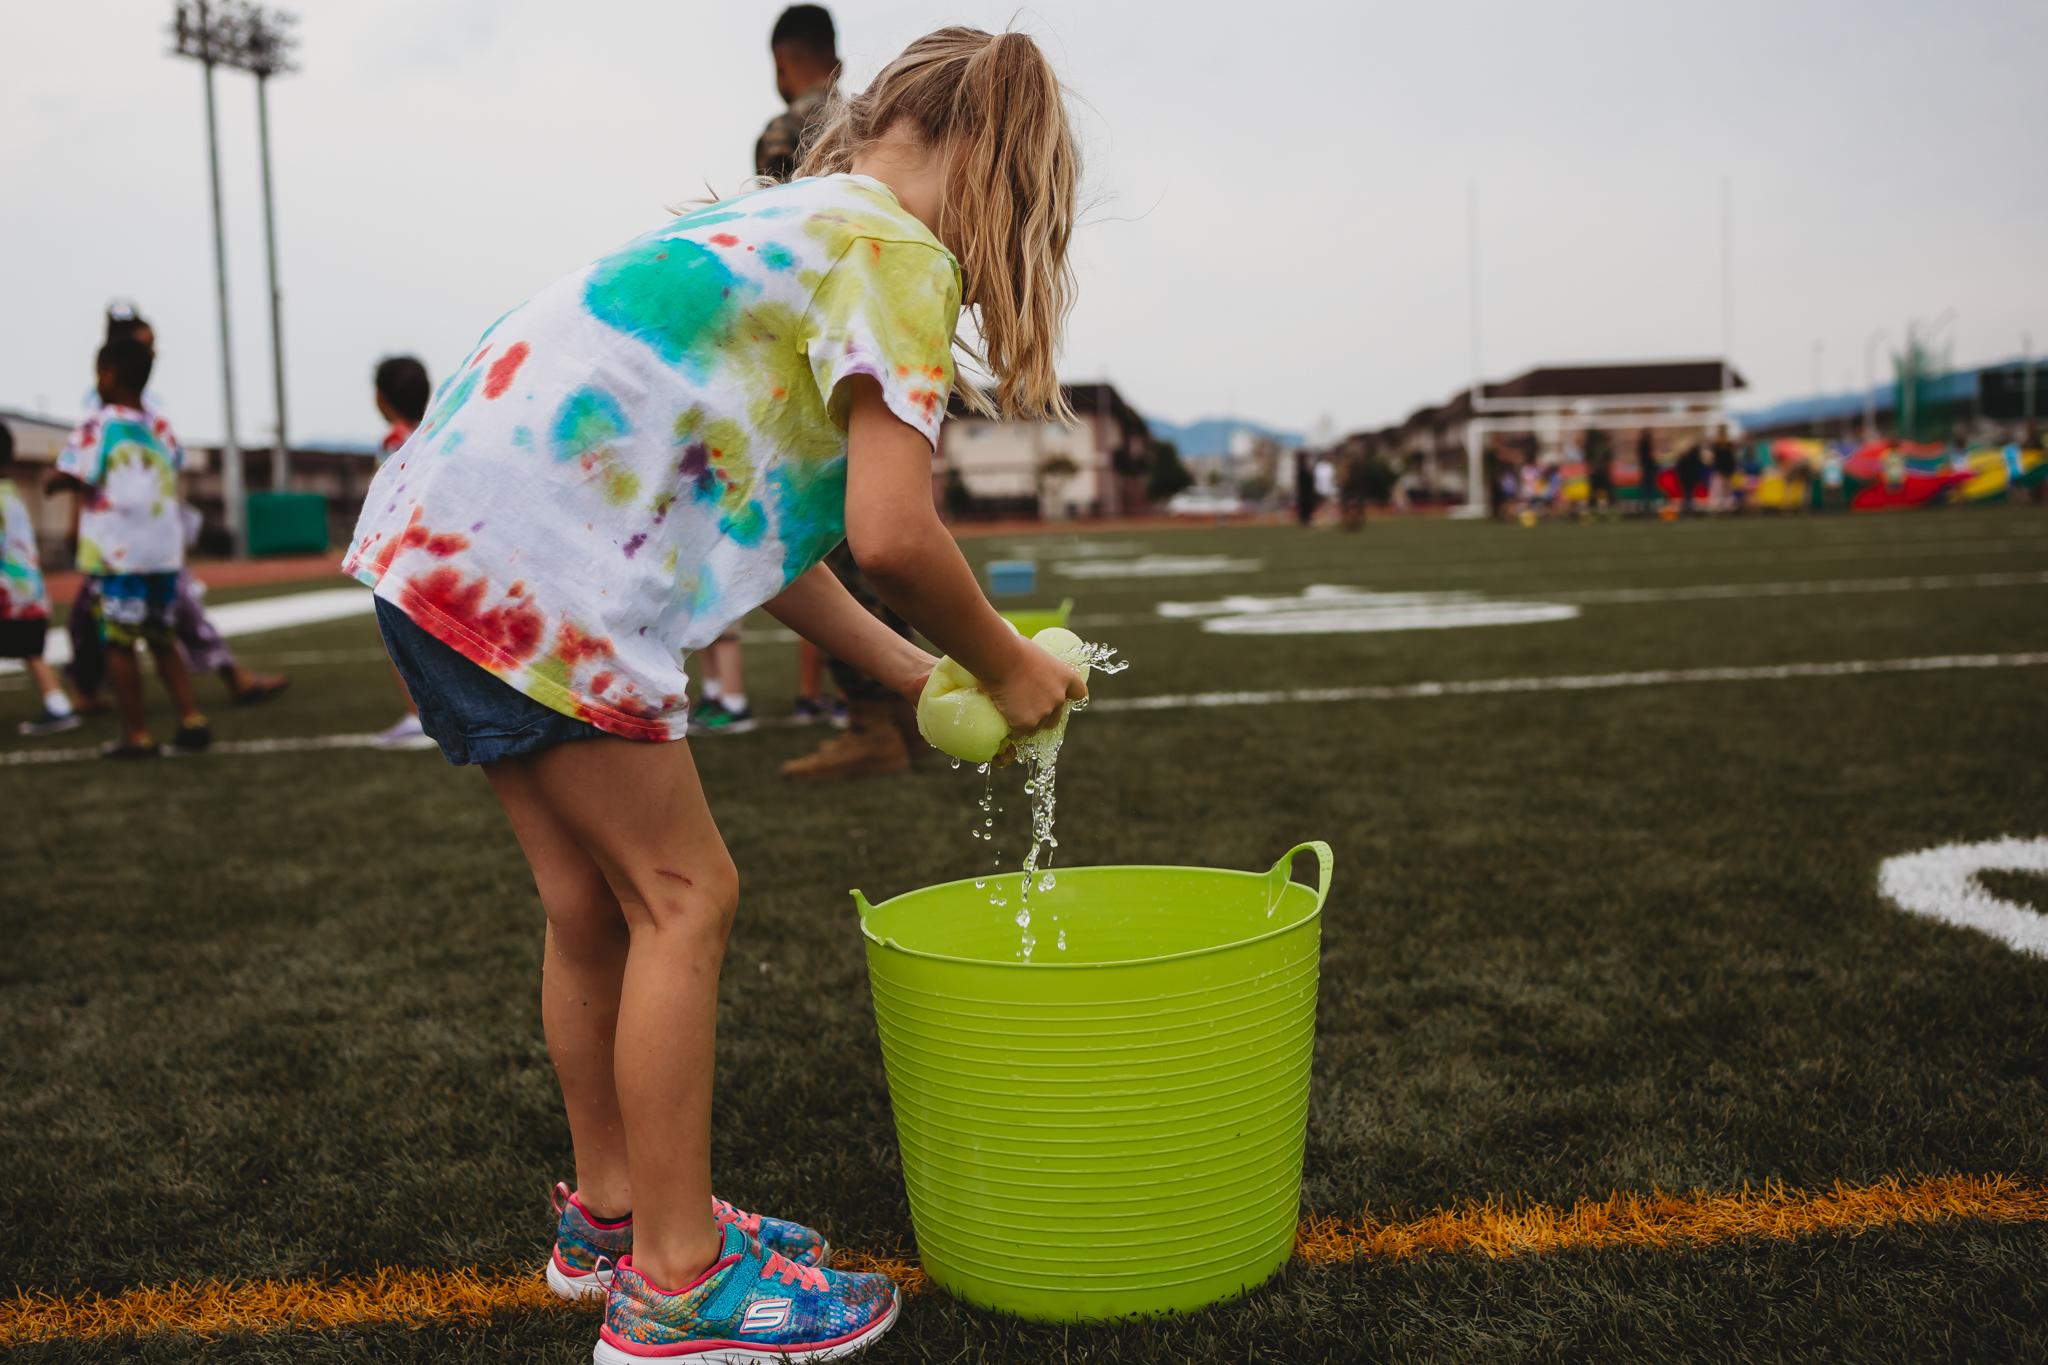 Kinder Field Day-7807.jpg